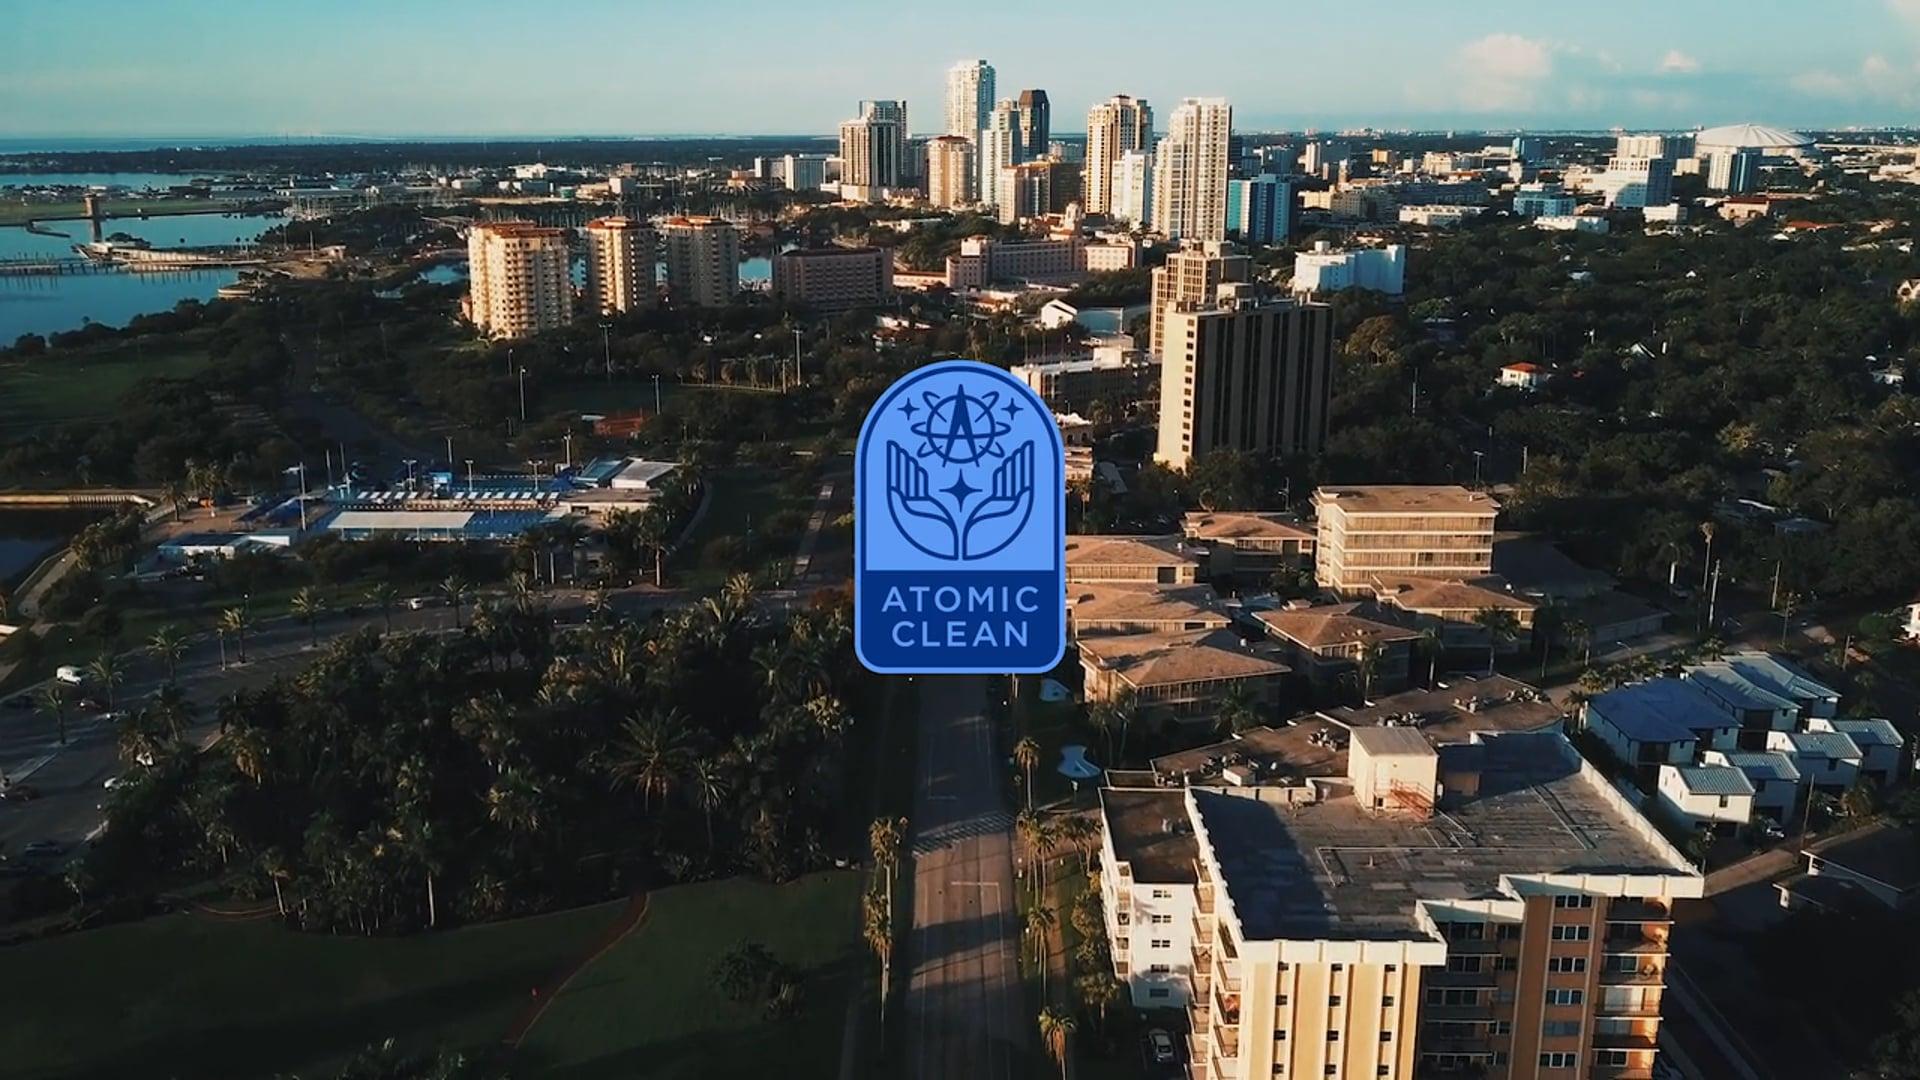 Atomic Clean: St. Petersburg, FL